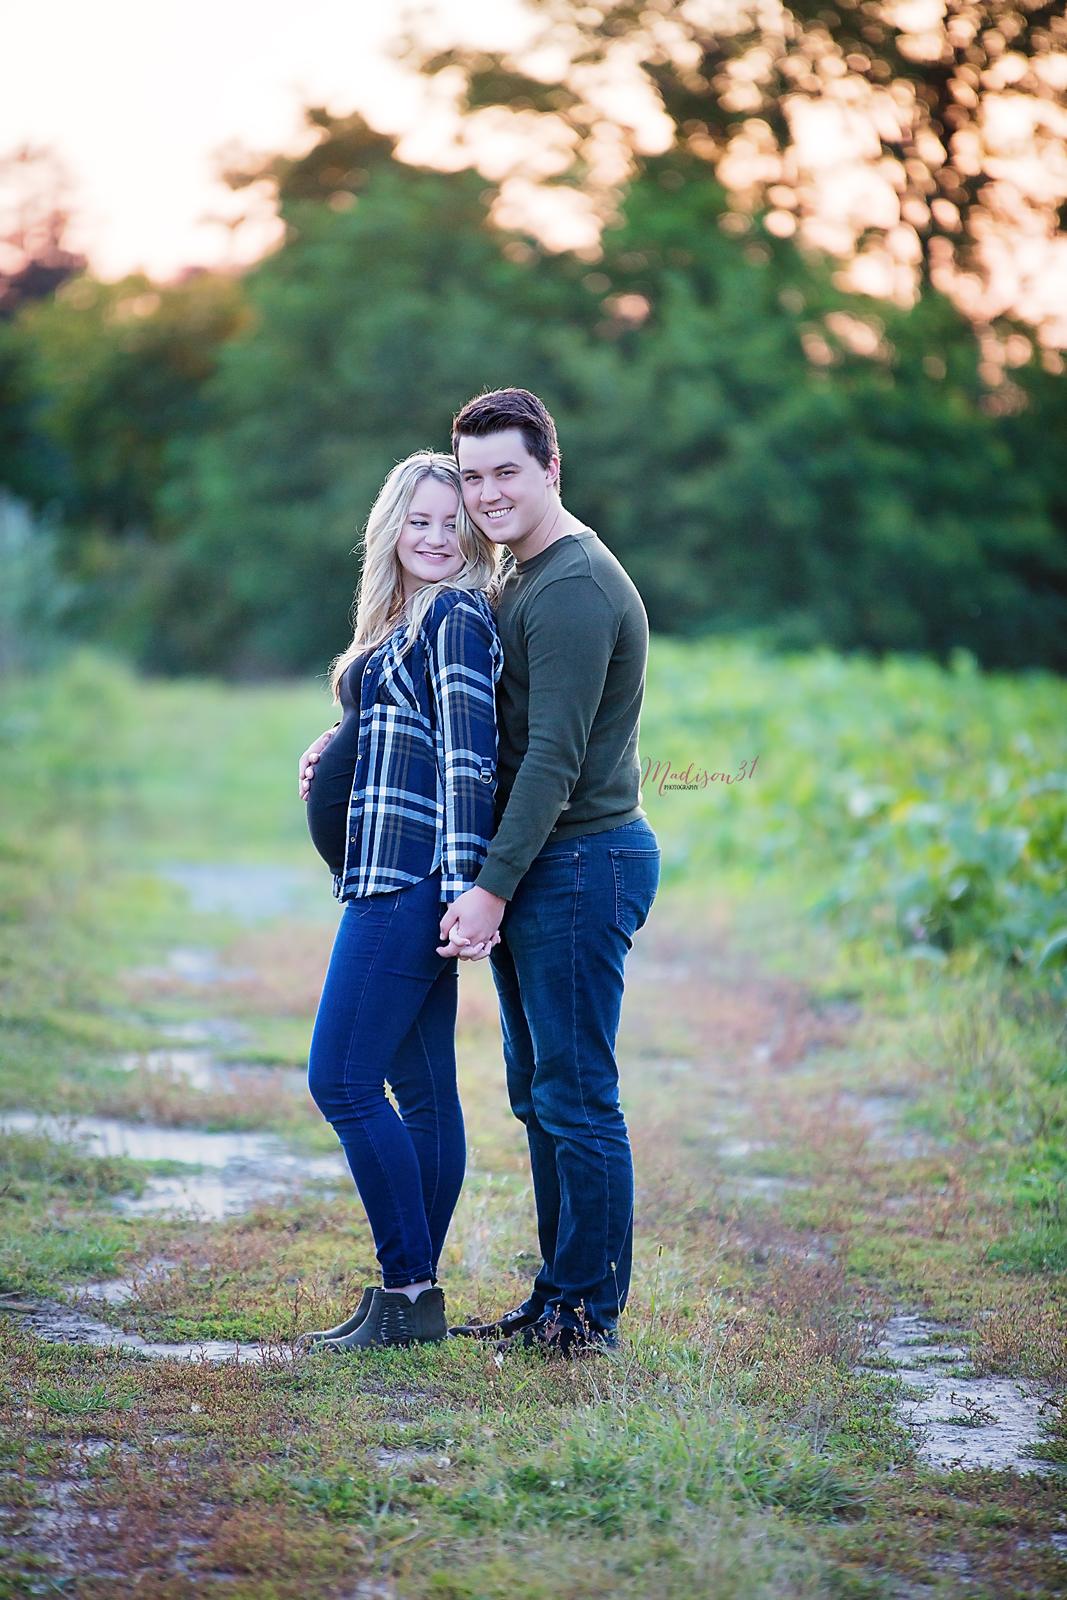 Conor&Sarah Maternity_0164 copy.jpg